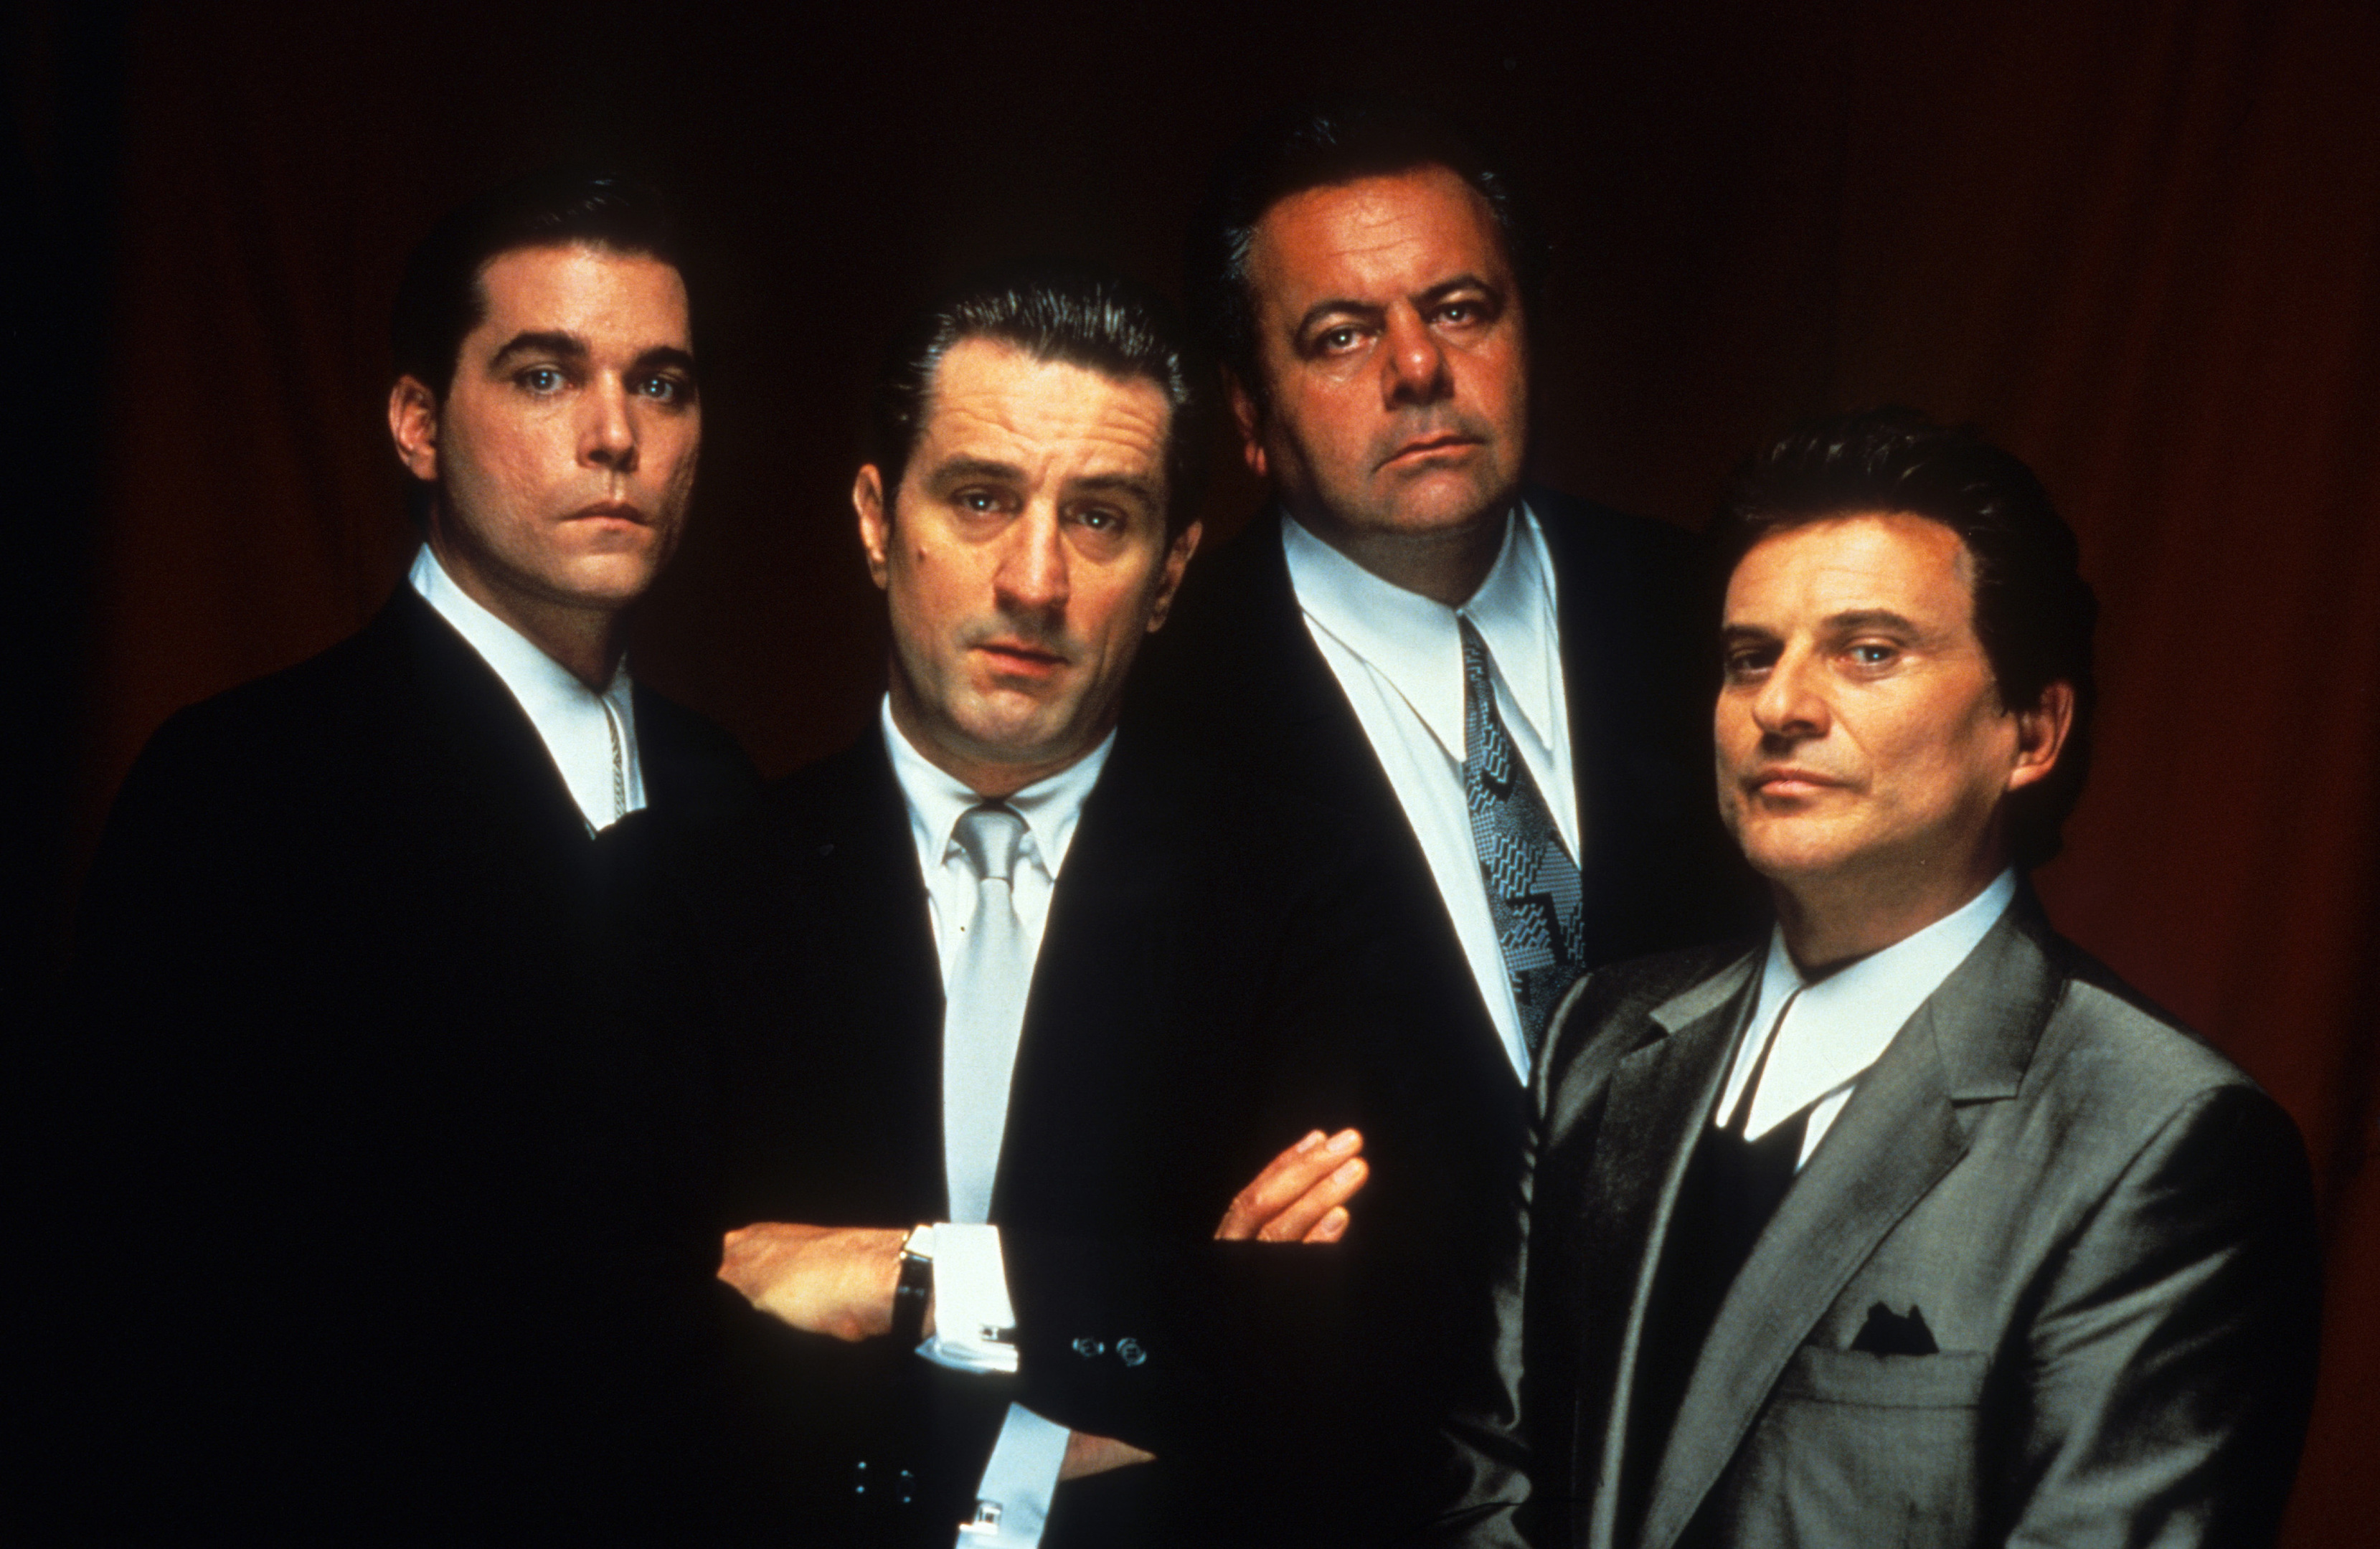 Ray Liotta, Robert De Niro, Paul Sorvino, and Joe Pesci in Goodfellas.